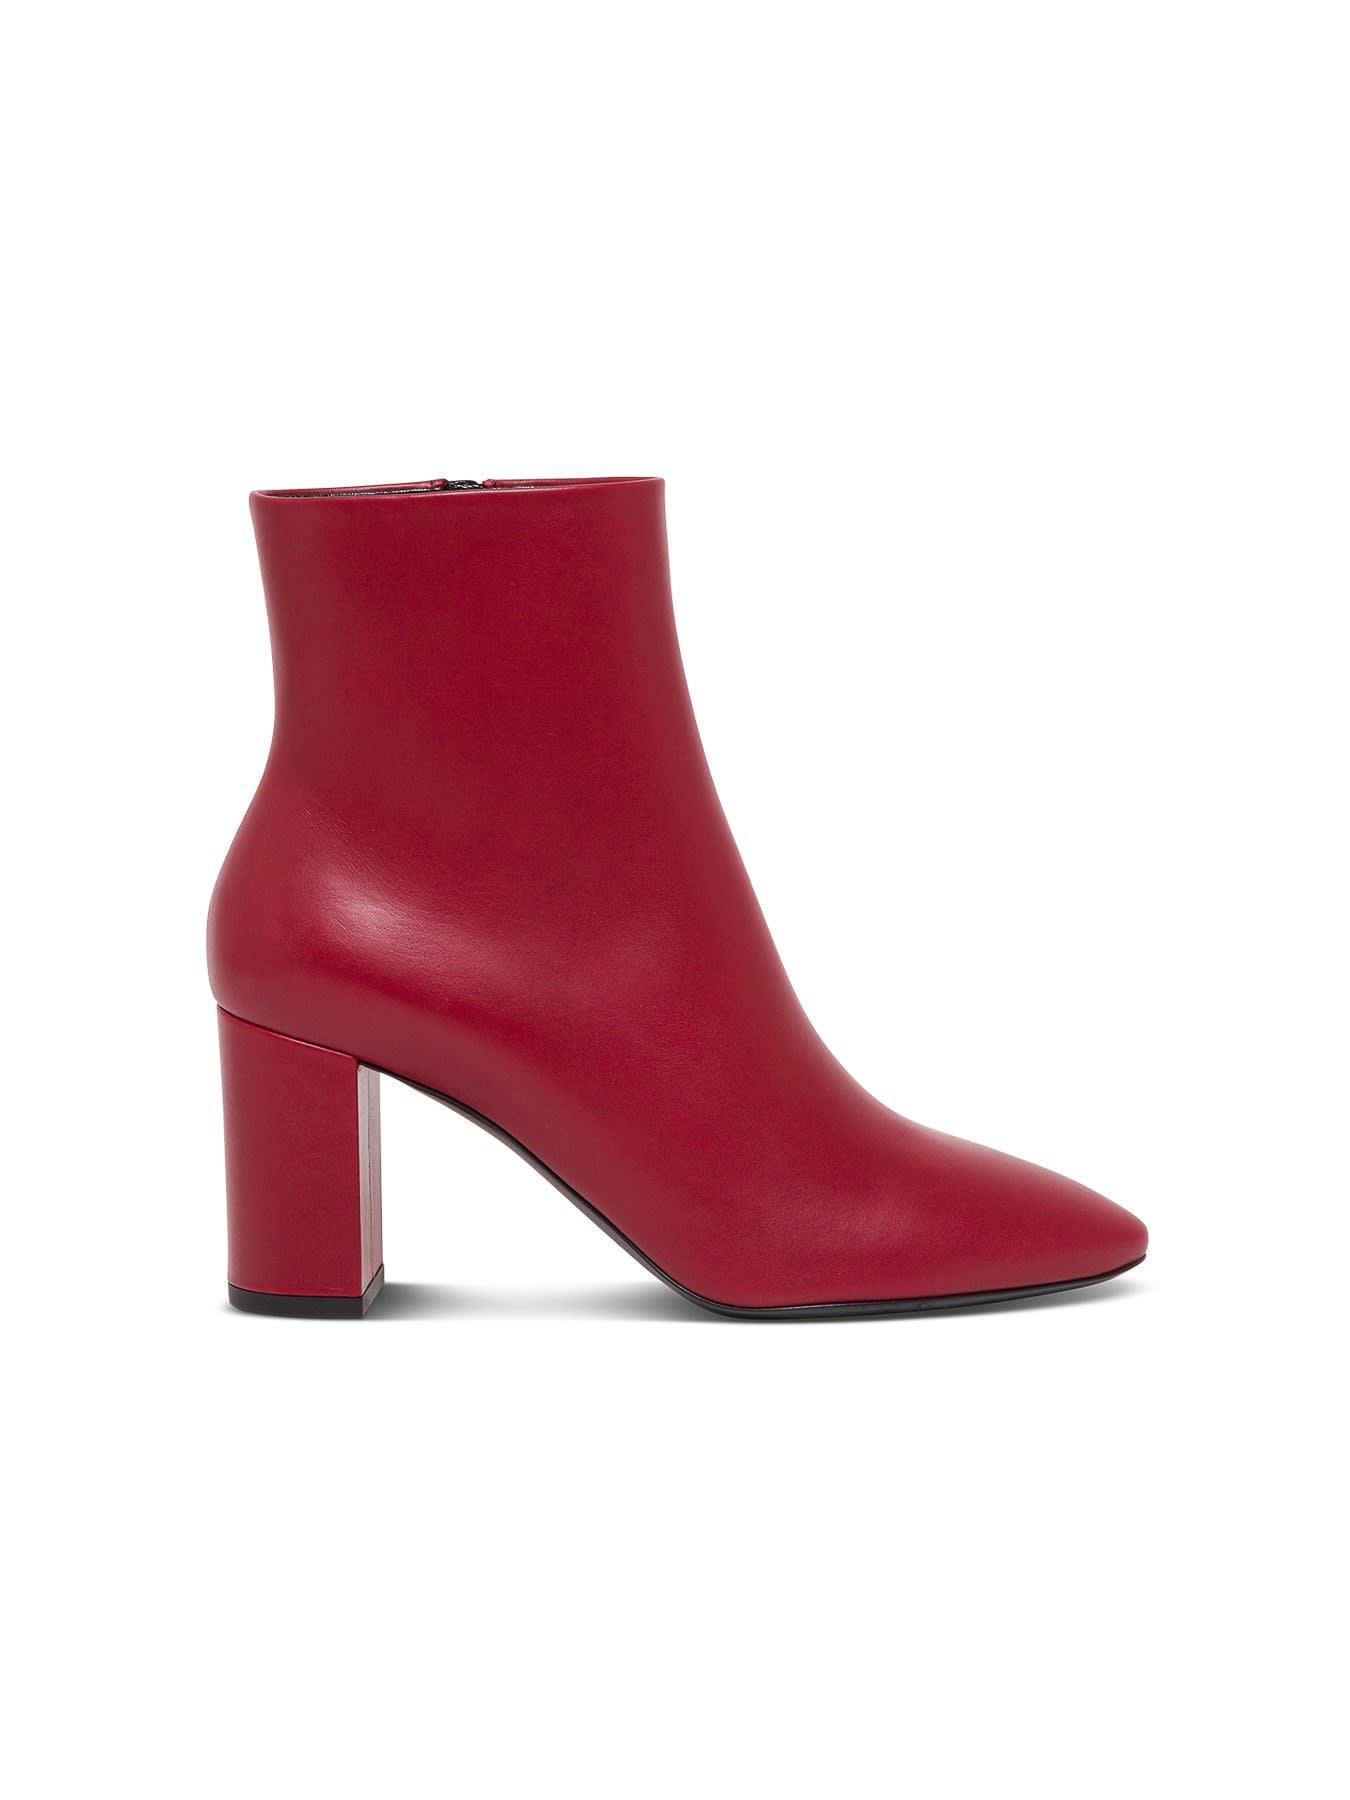 Buy Saint Laurent Lou 70 Leather Ankle Boots online, shop Saint Laurent shoes with free shipping